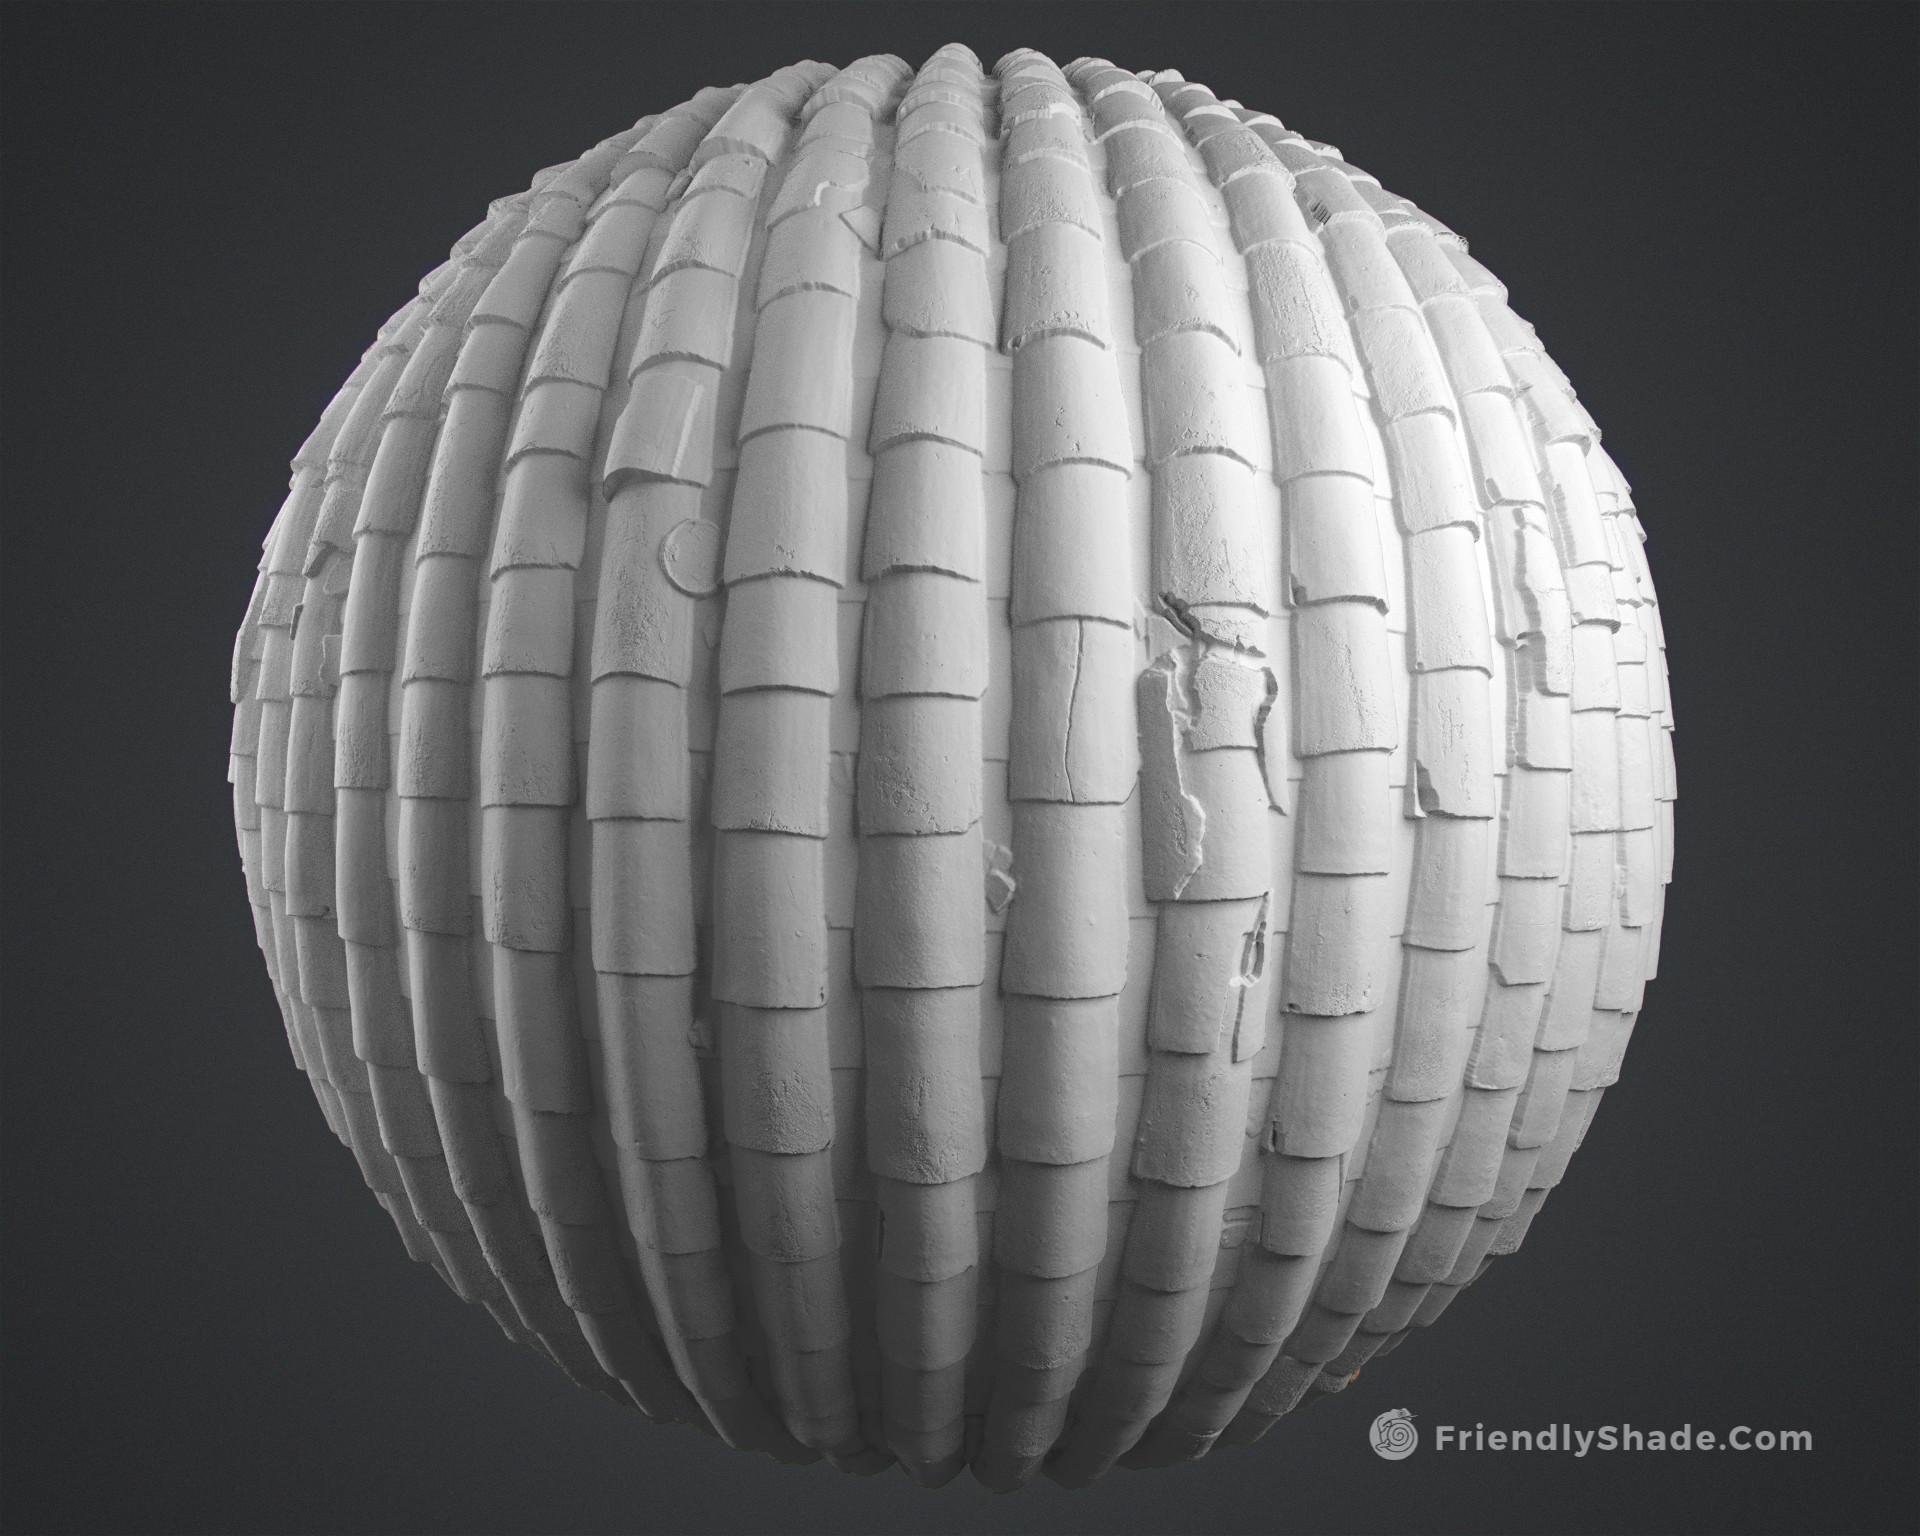 https://cdna.artstation.com/p/assets/images/images/004/312/180/large/sebastian-zapata-sphere-clay-post.jpg?1482316291